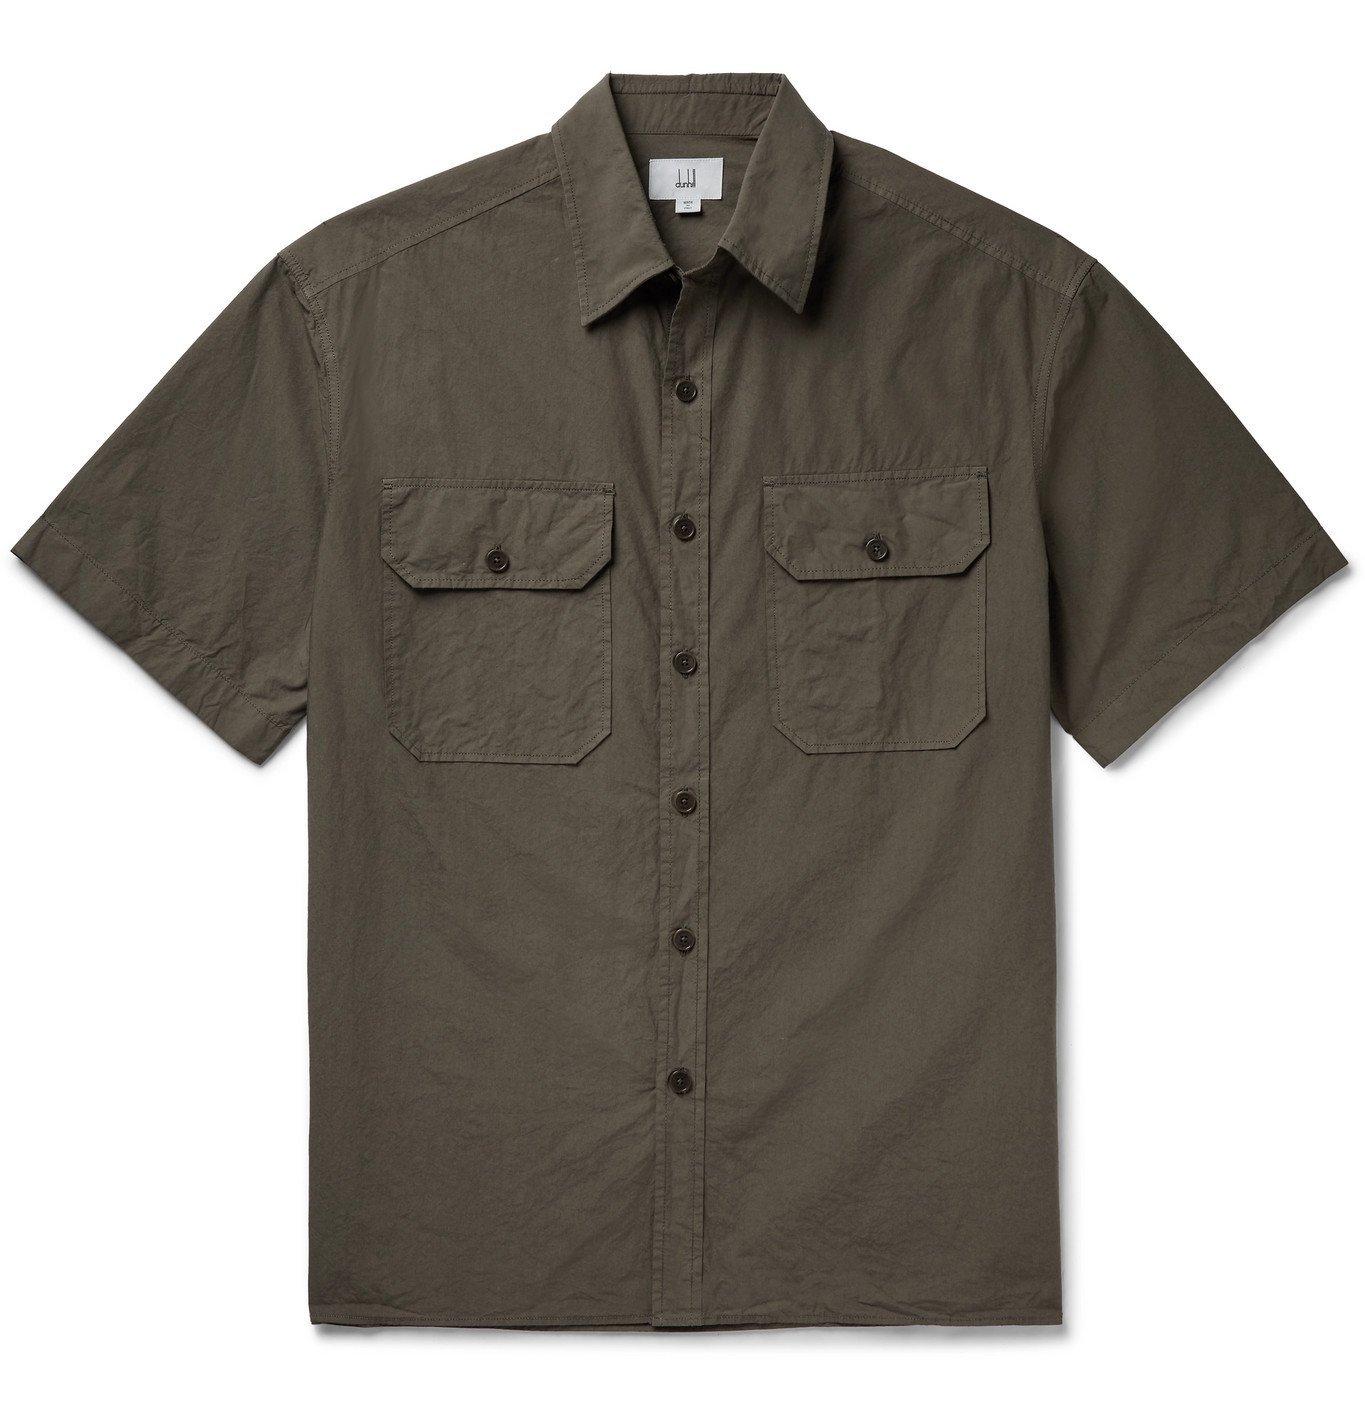 DUNHILL - Garment-Dyed Cotton Shirt - Brown